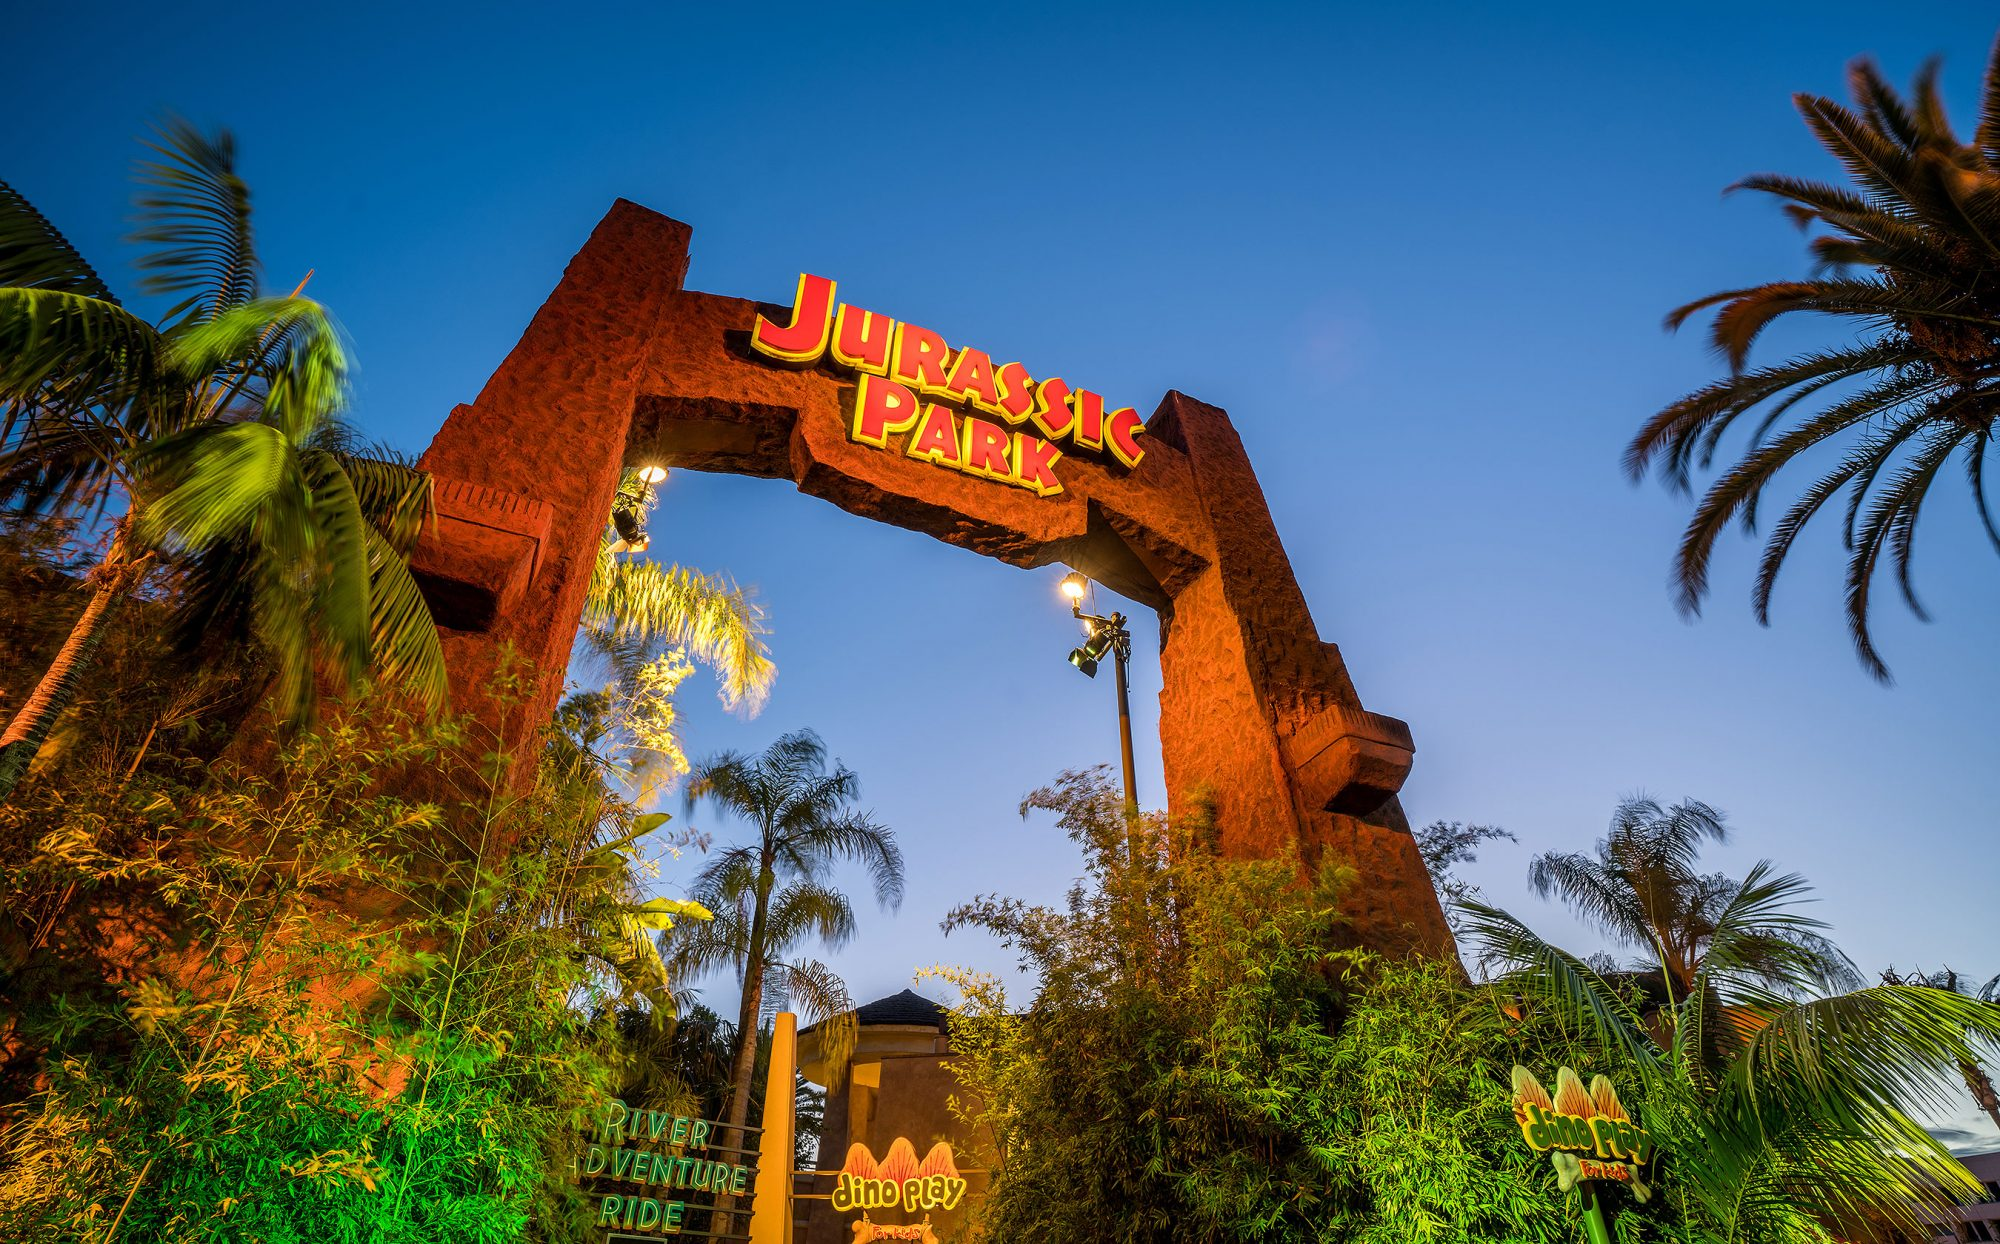 Jurassic Park rideCredit: Universal Studios